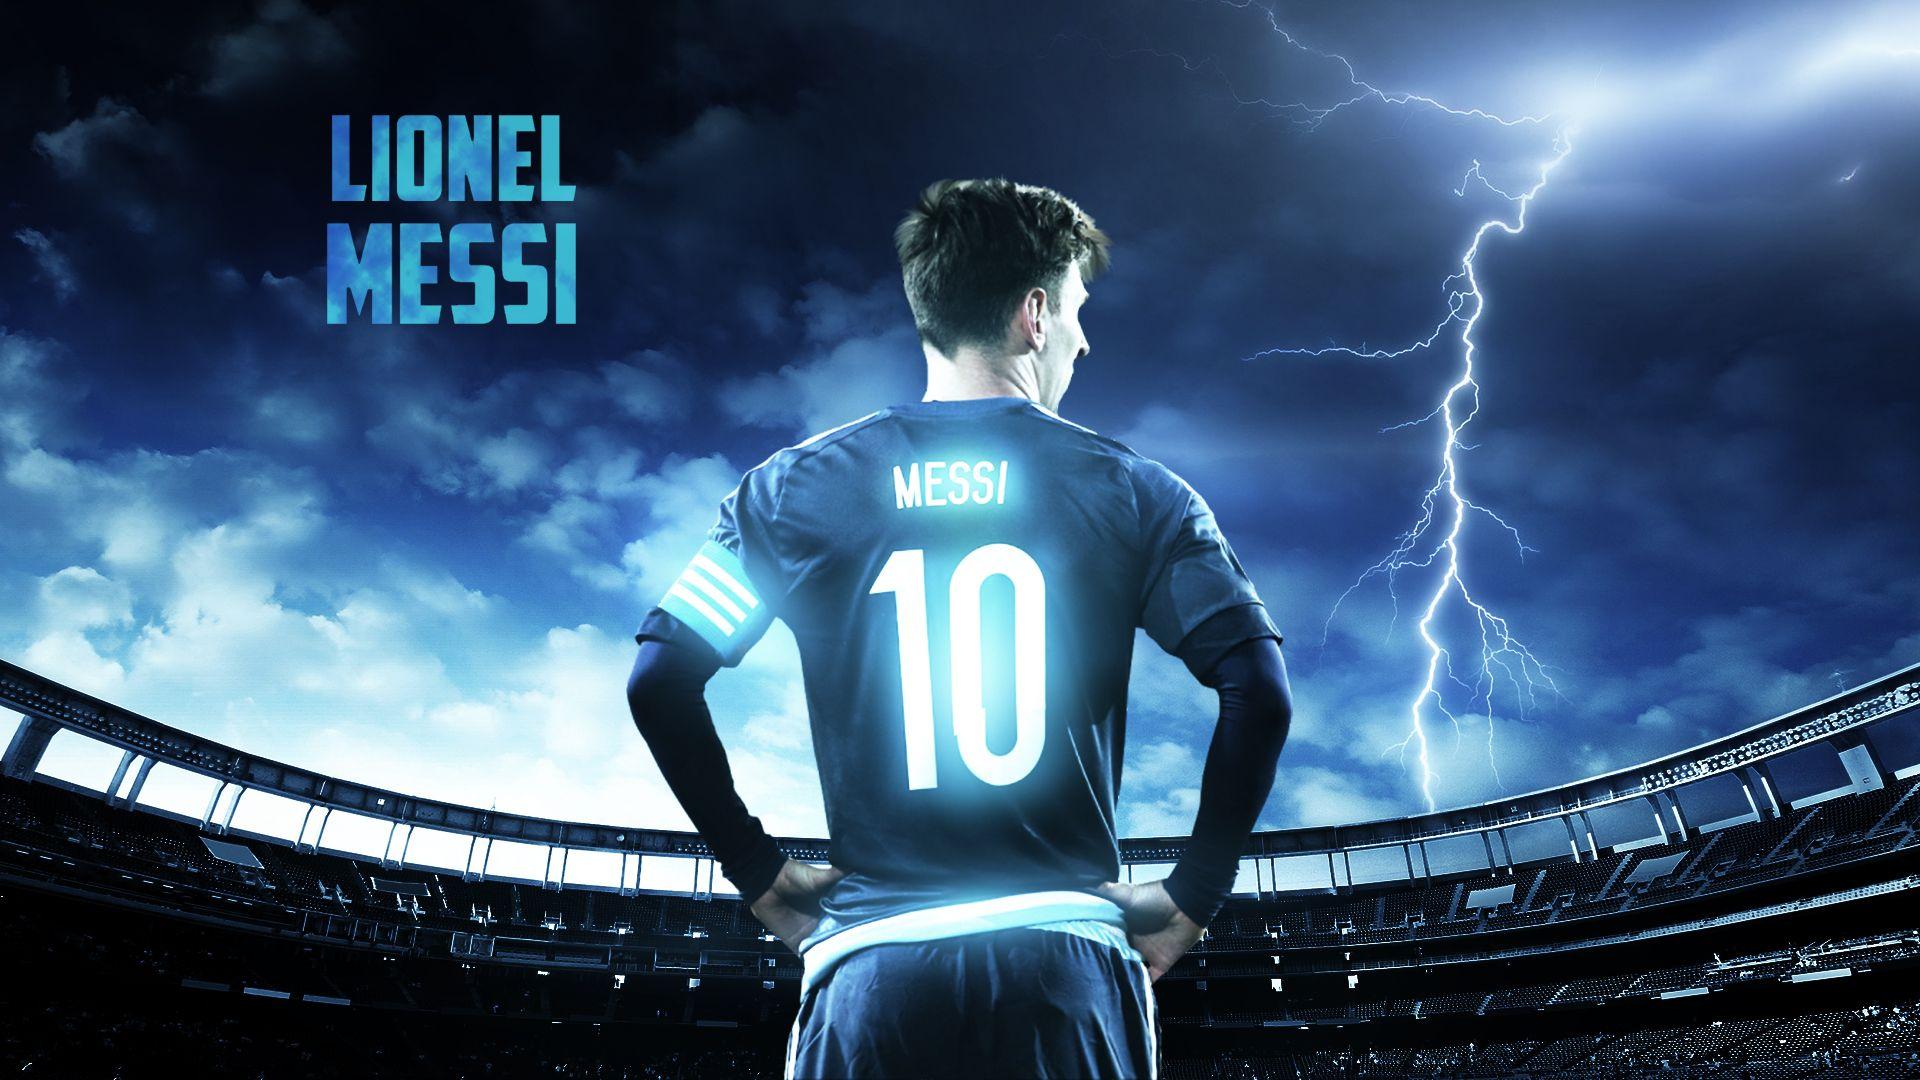 Messi 3d Wallpaper Best Wallpaper Hd Lionel Messi Wallpapers Lionel Messi Leo Messi